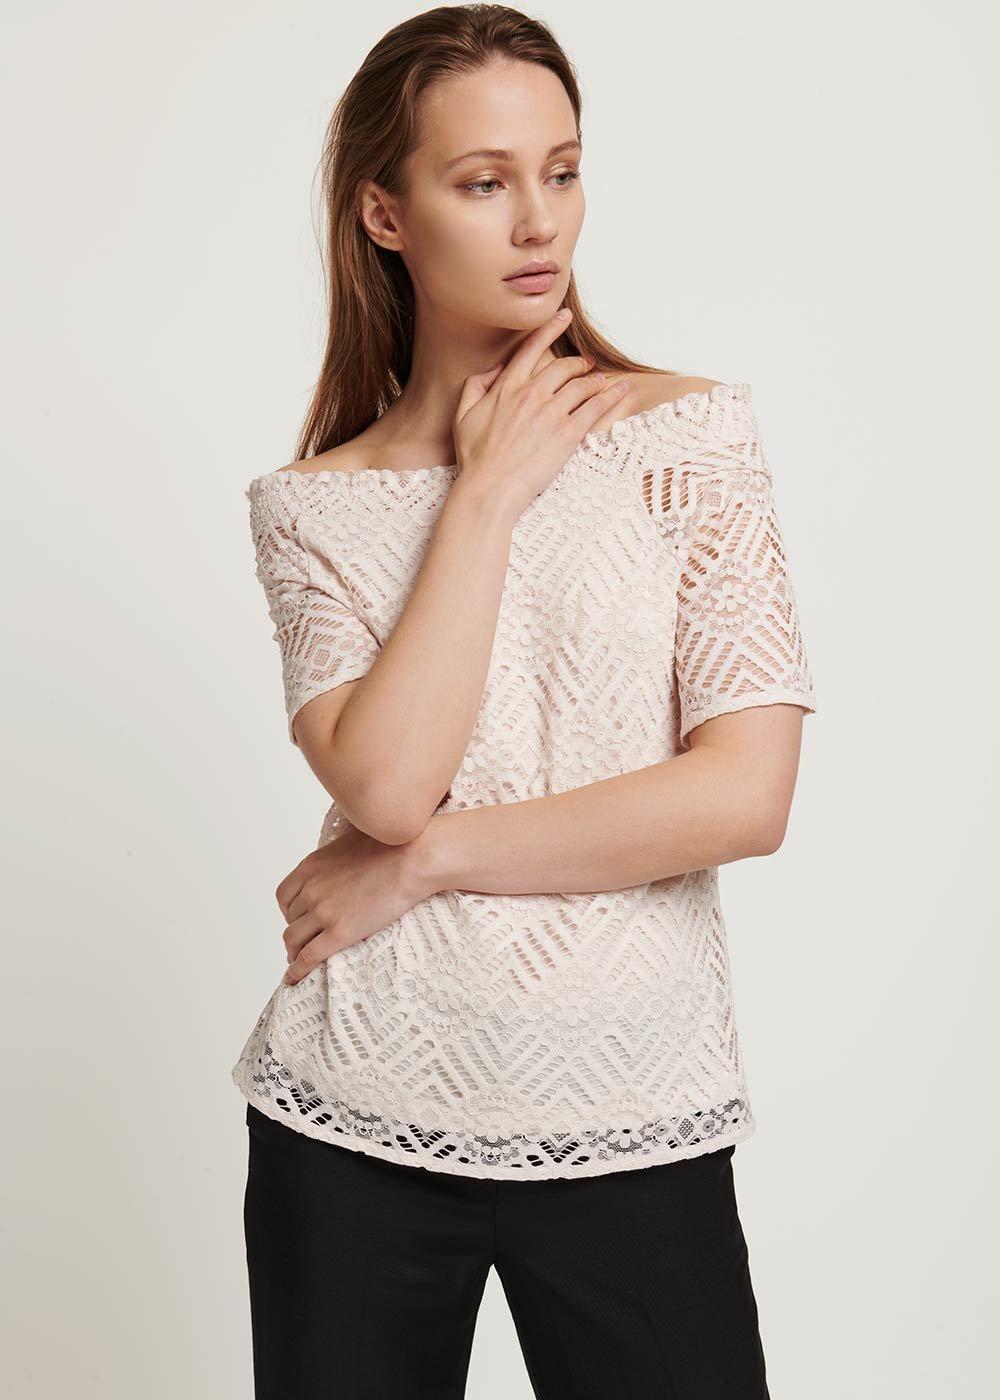 Stefania lace T-shirt - Light Beige - Woman